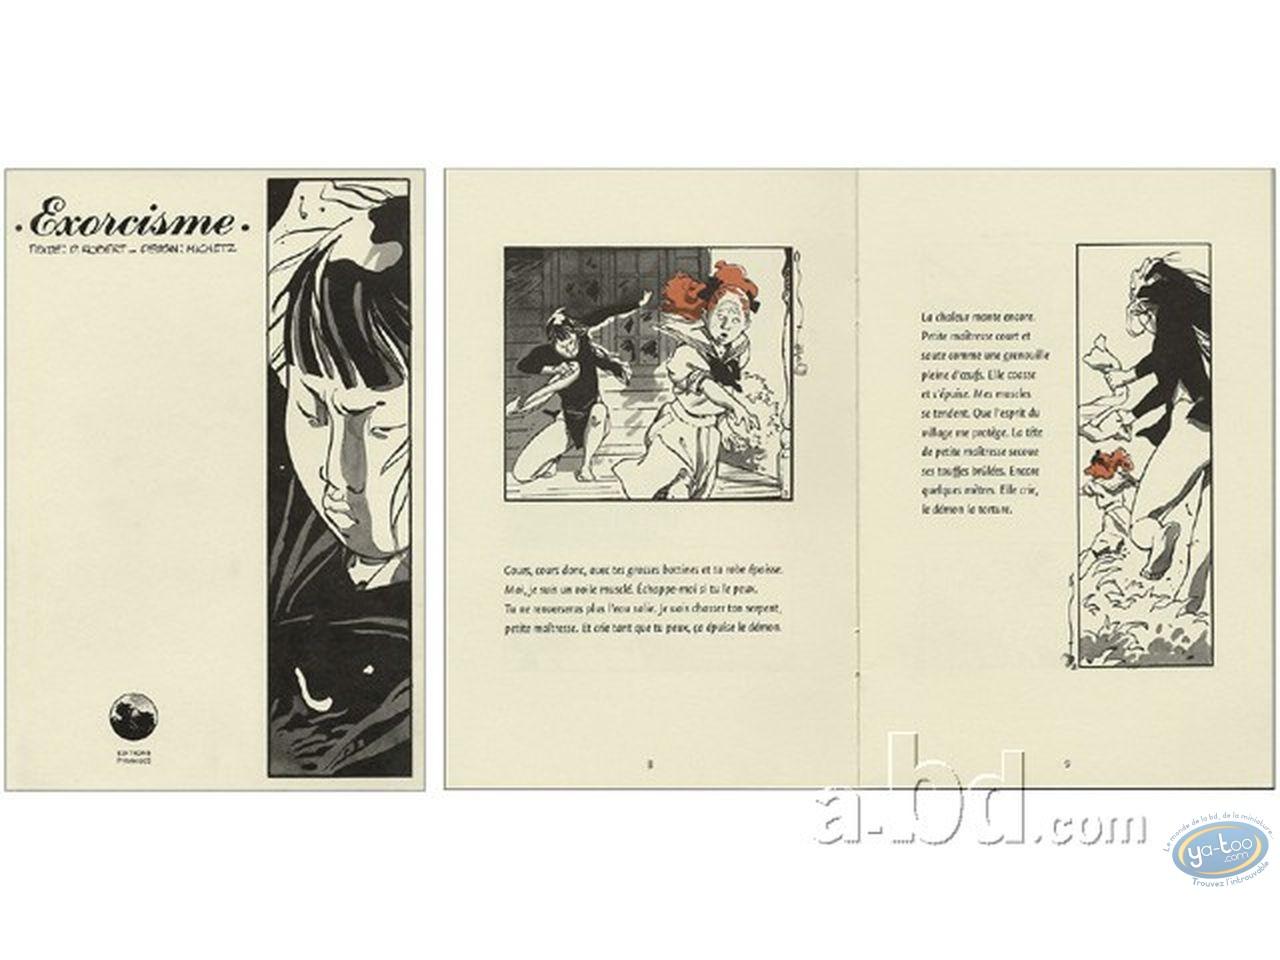 Deluxe Edition, Kogaratsu : Michetz, Exorcisme